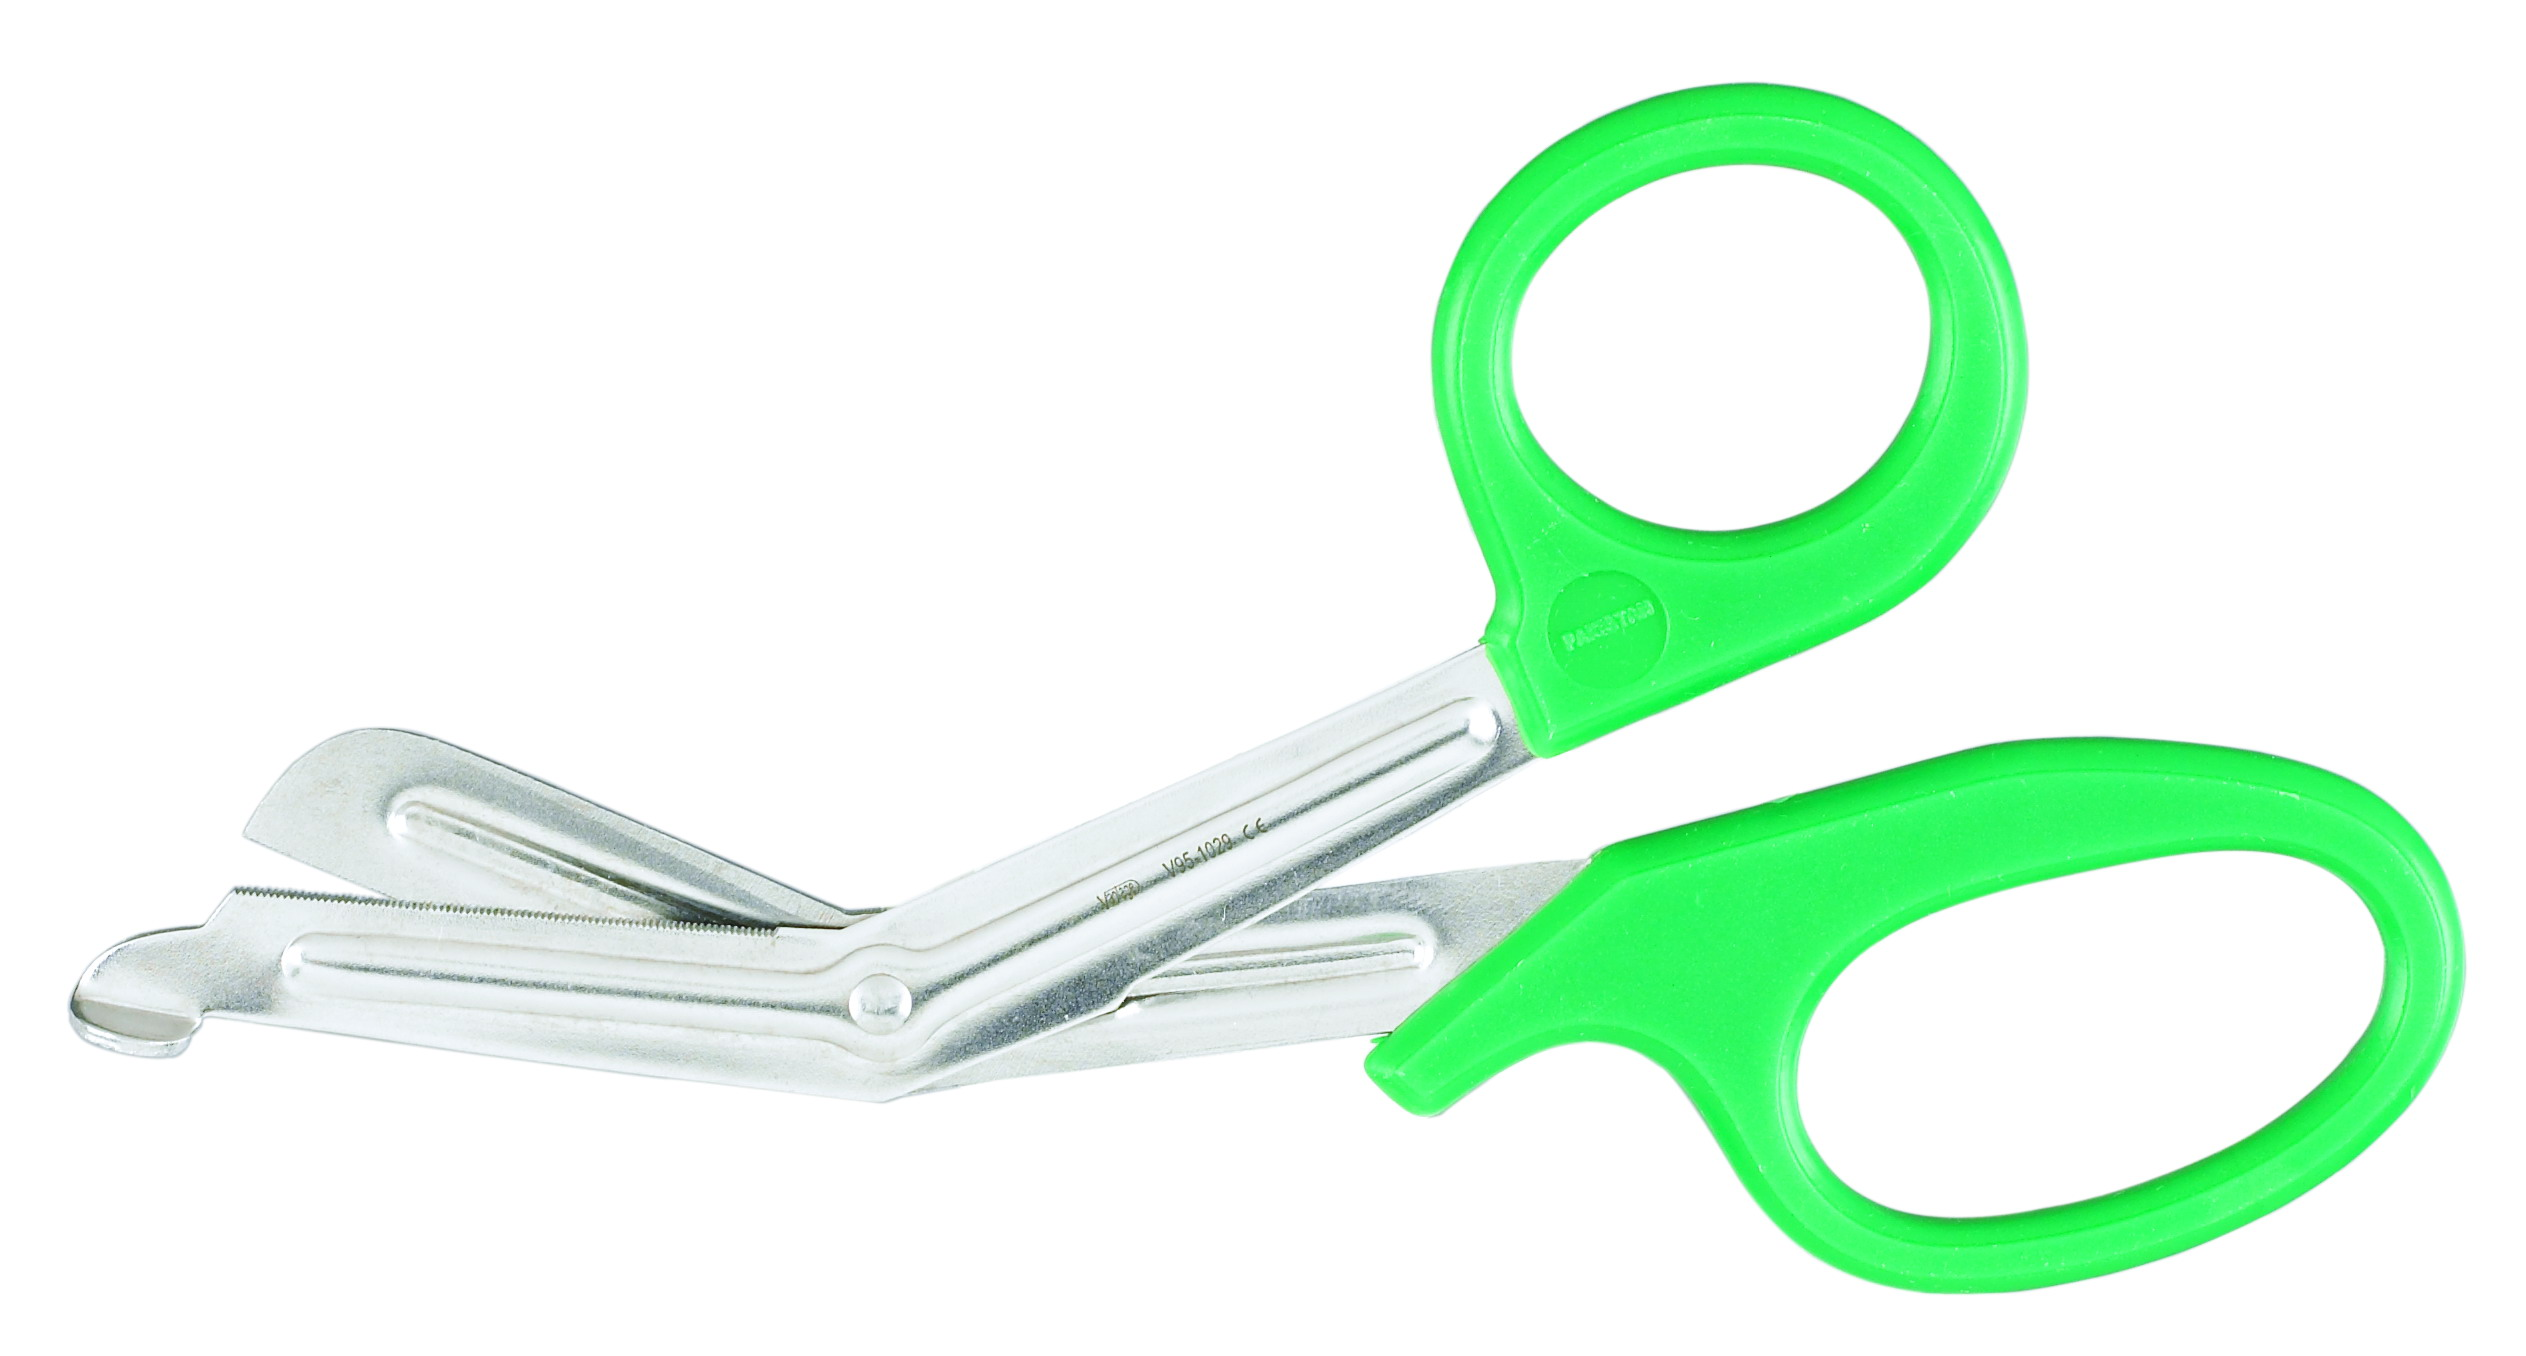 7-1-2-vantage-universal-scissors-green-handle-v95-1029-miltex.jpg